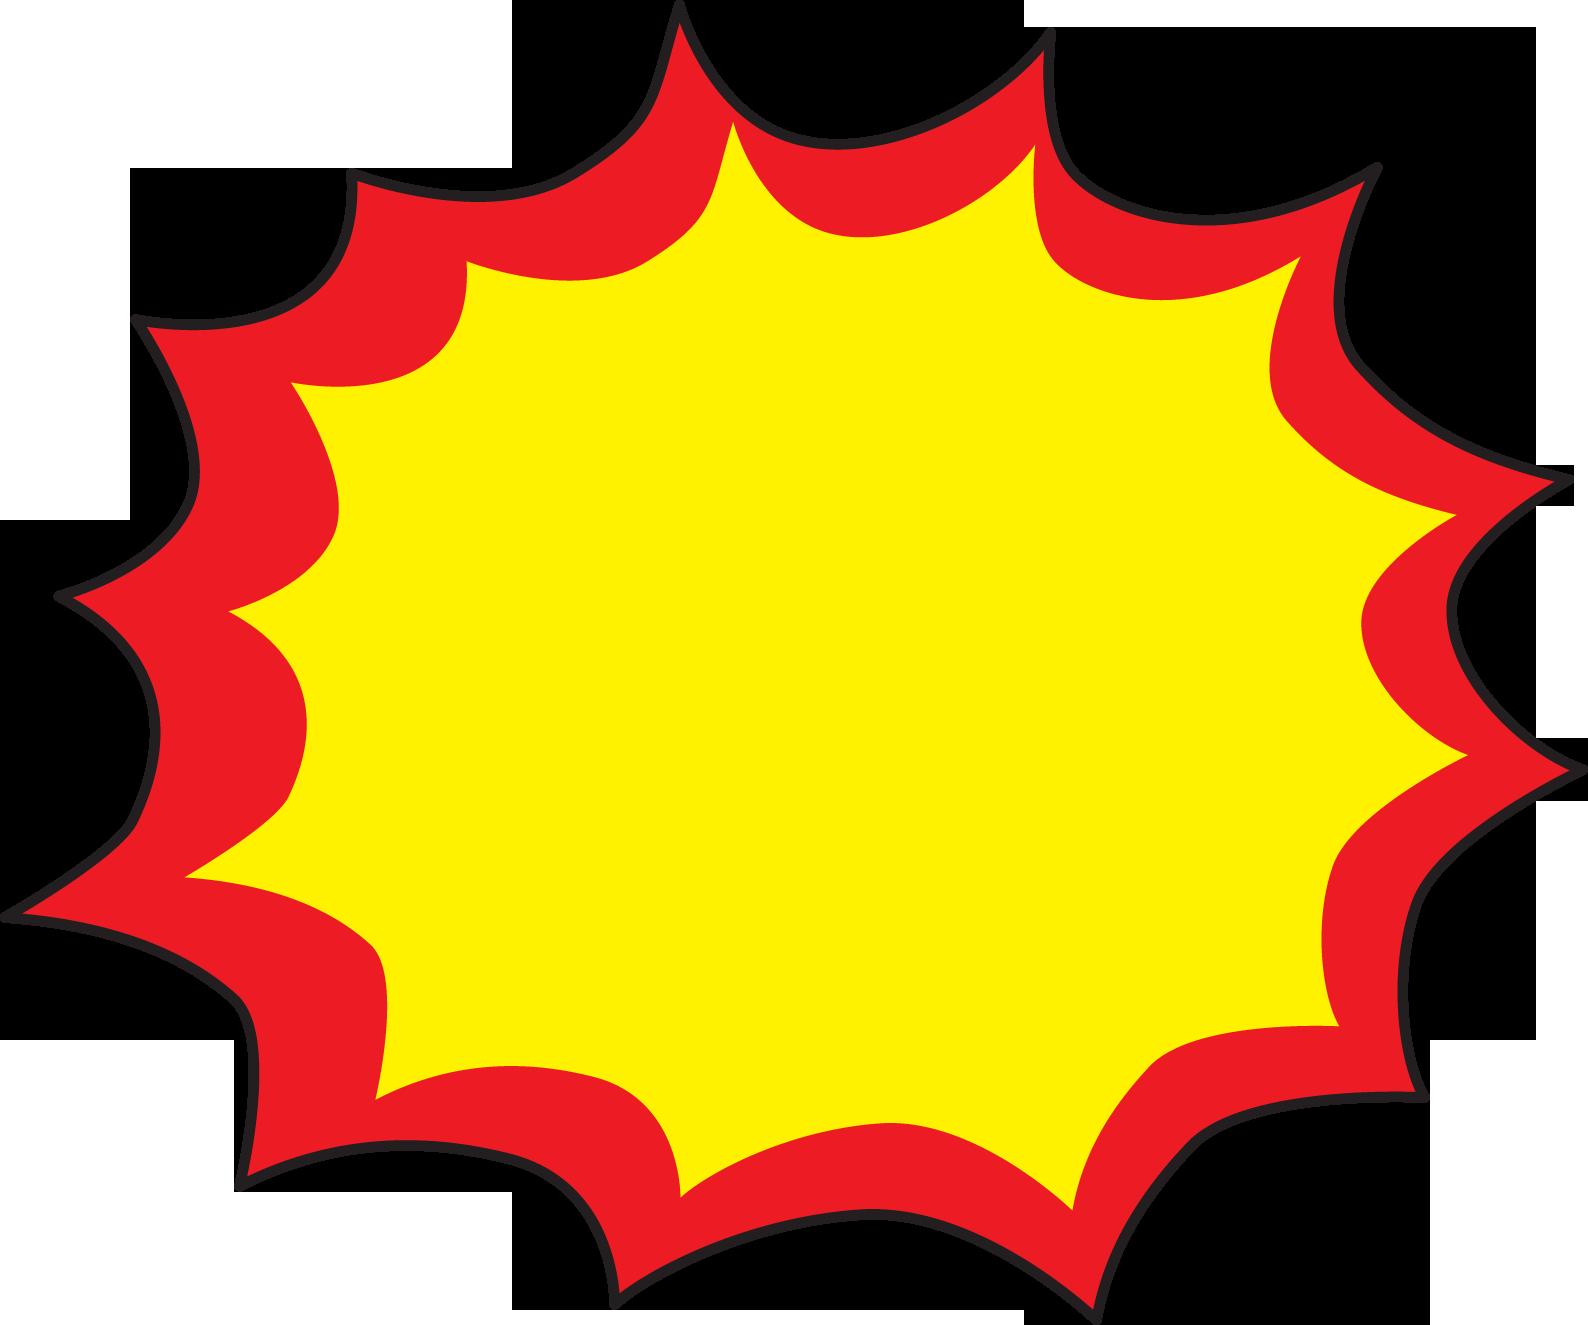 Boom clipart starburst, Boom starburst Transparent FREE for.